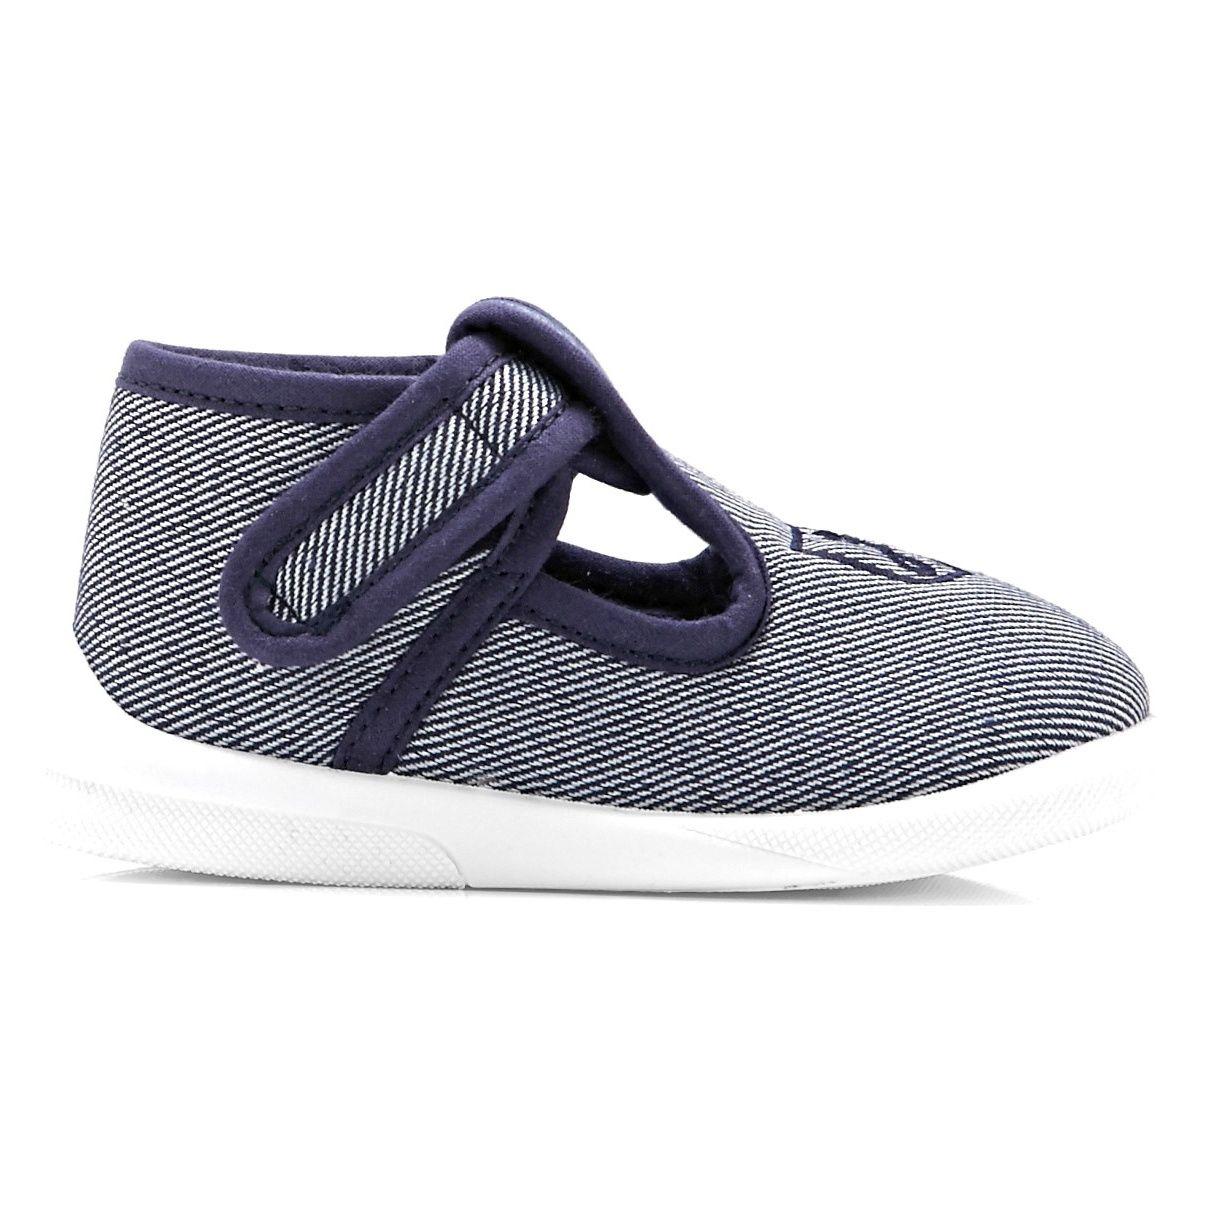 کفش چسبی نوزادی پسرانه Sommeil - جاکادی - آبي - 1